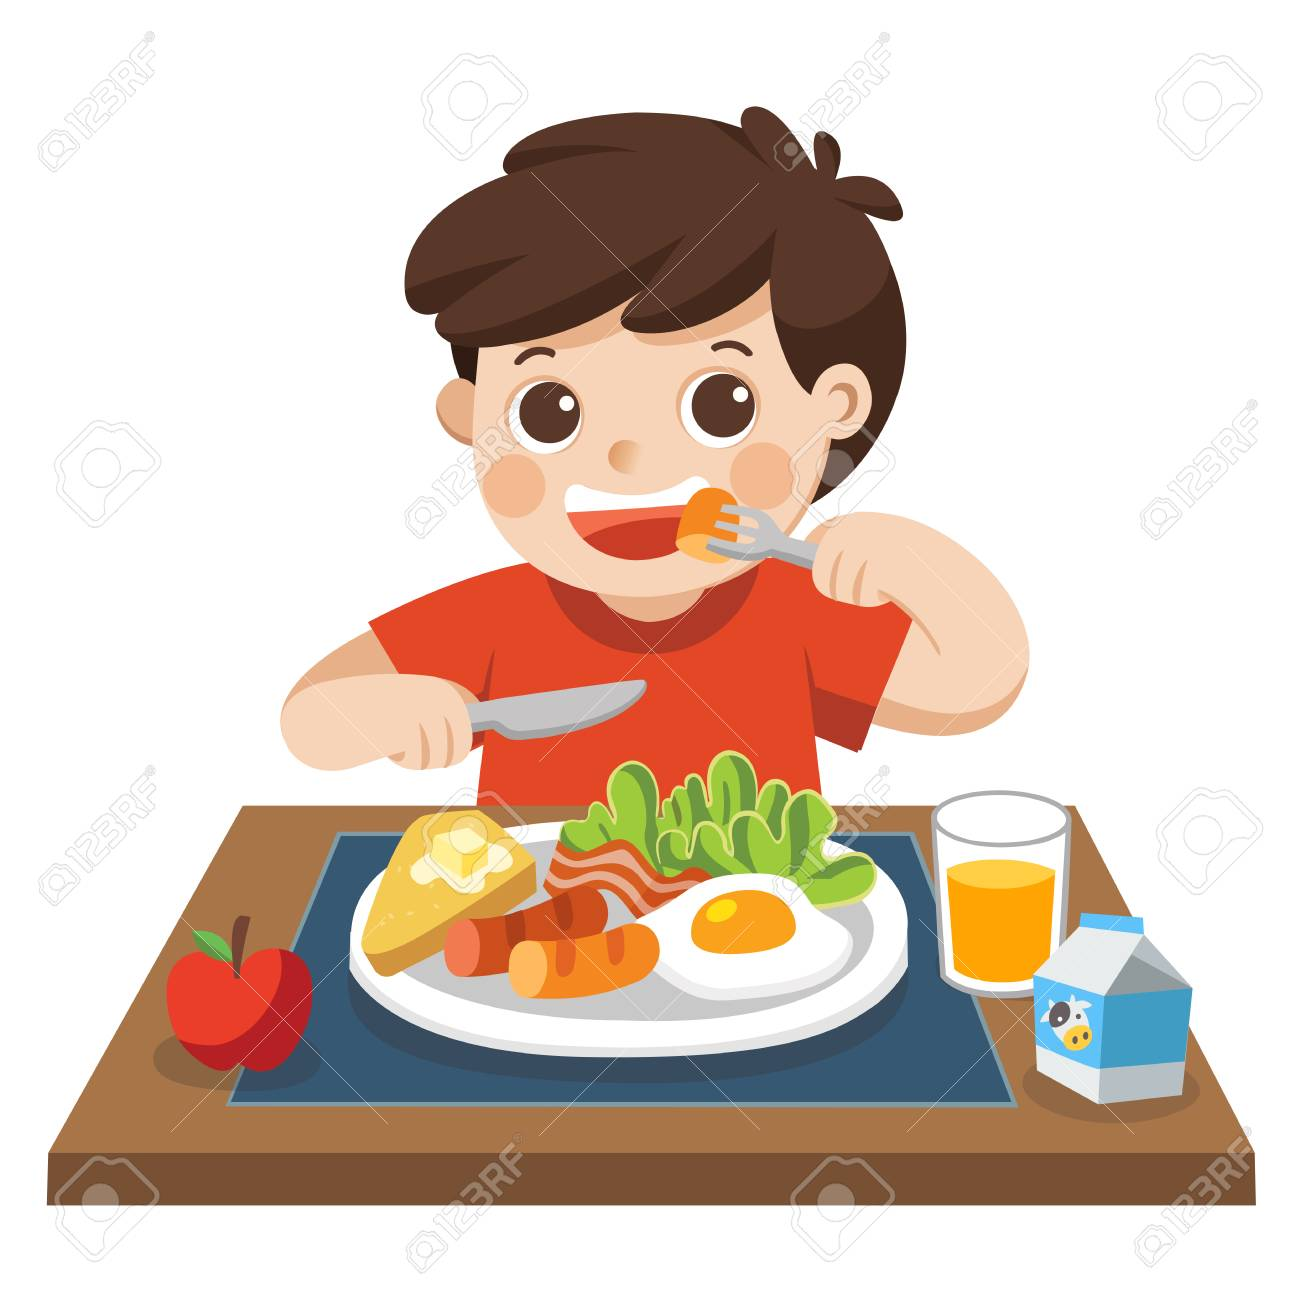 A little boy happy to eat breakfast in the morning. - 125673806